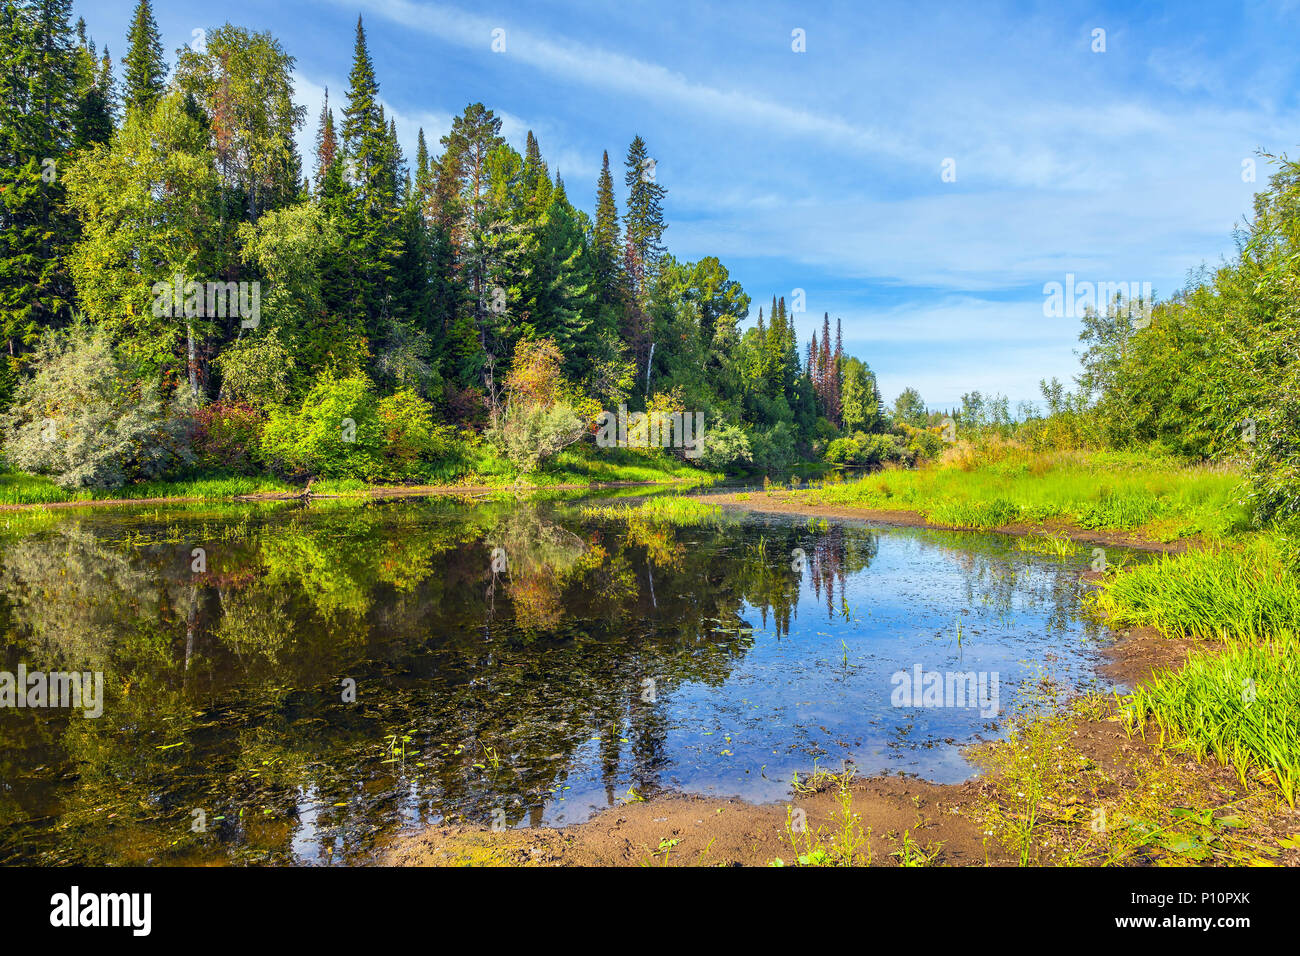 Siberian taiga. - Stock Image